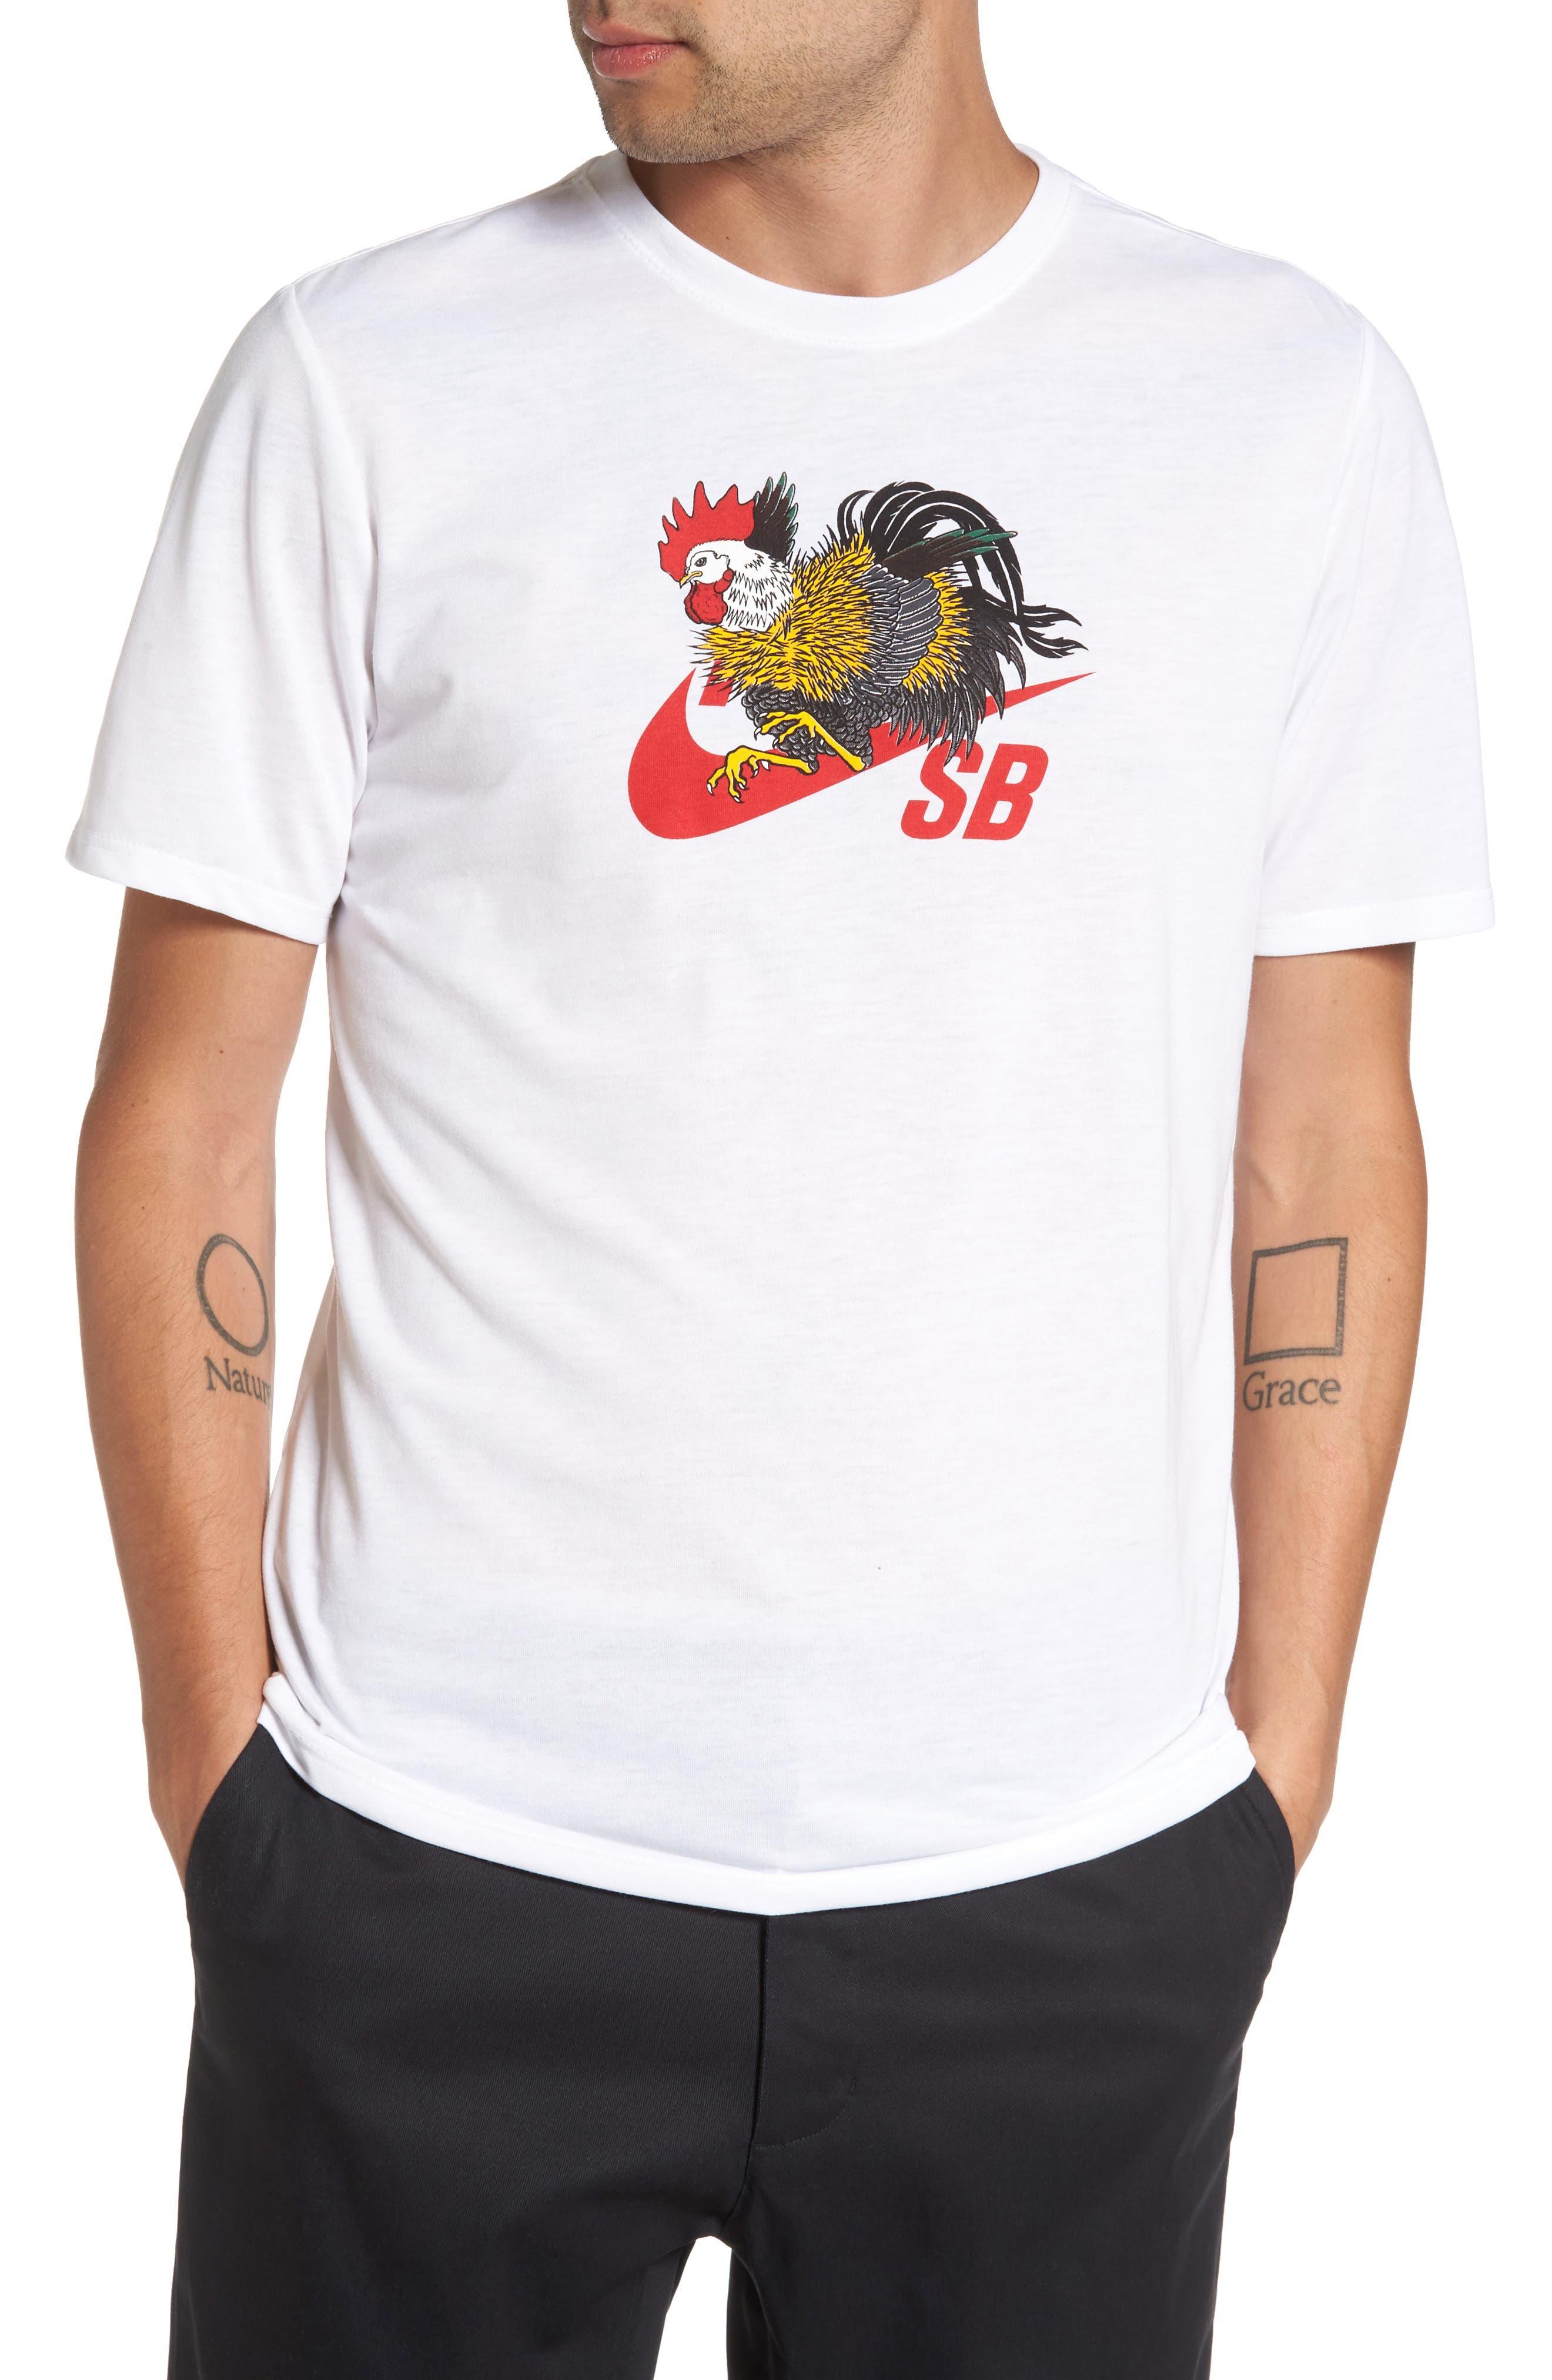 NIKE SB,                             Dry Rooster T-Shirt,                             Main thumbnail 1, color,                             100